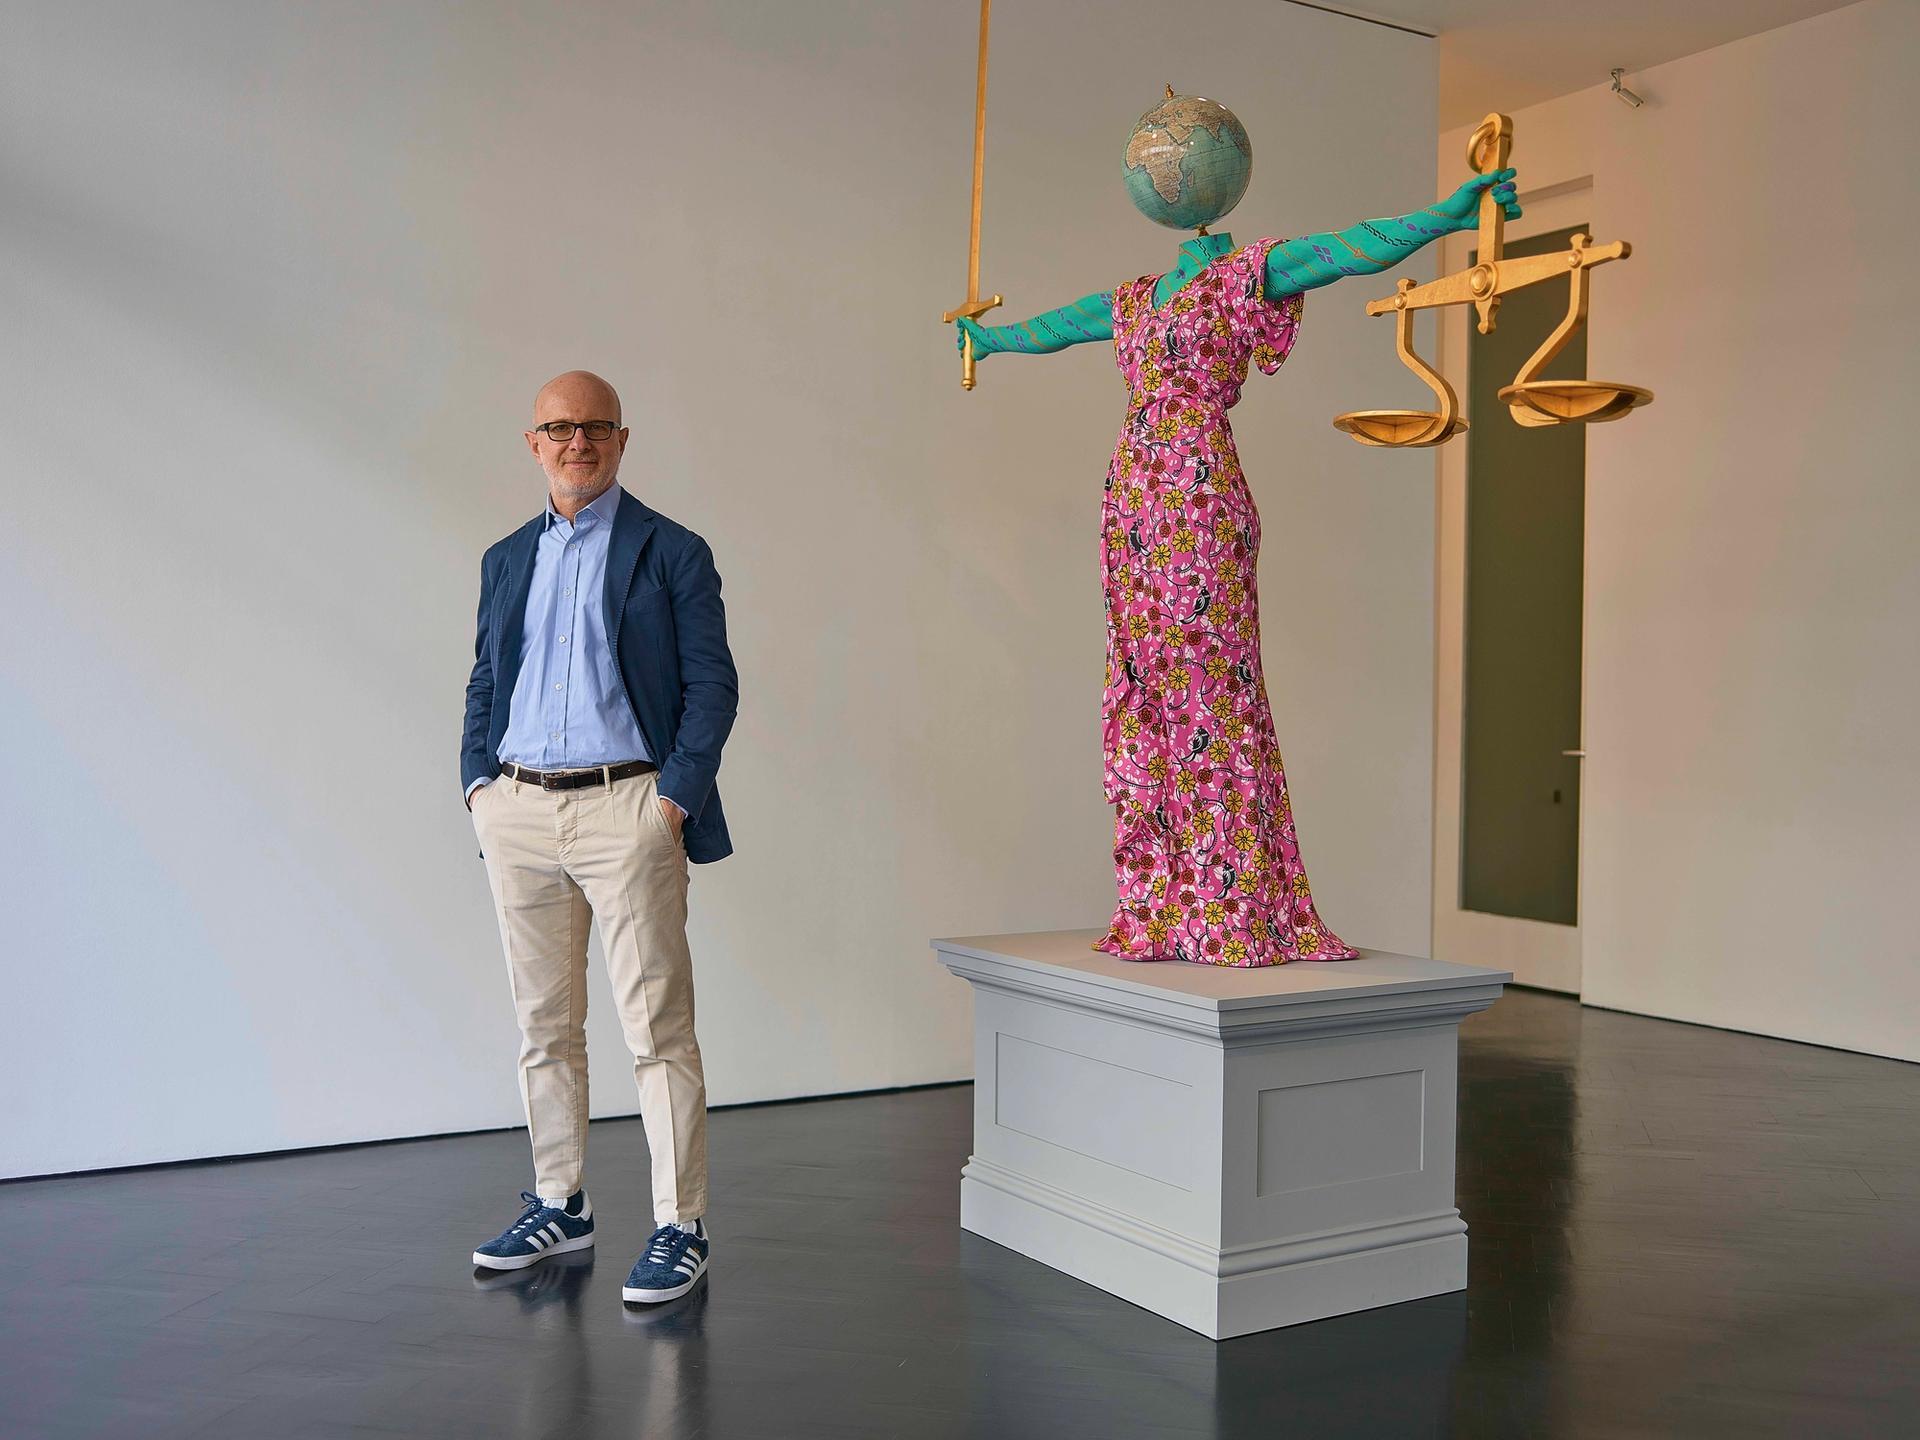 Stephen Friedman with a Yinka Shonibare work in his gallery © Tom Jamieson